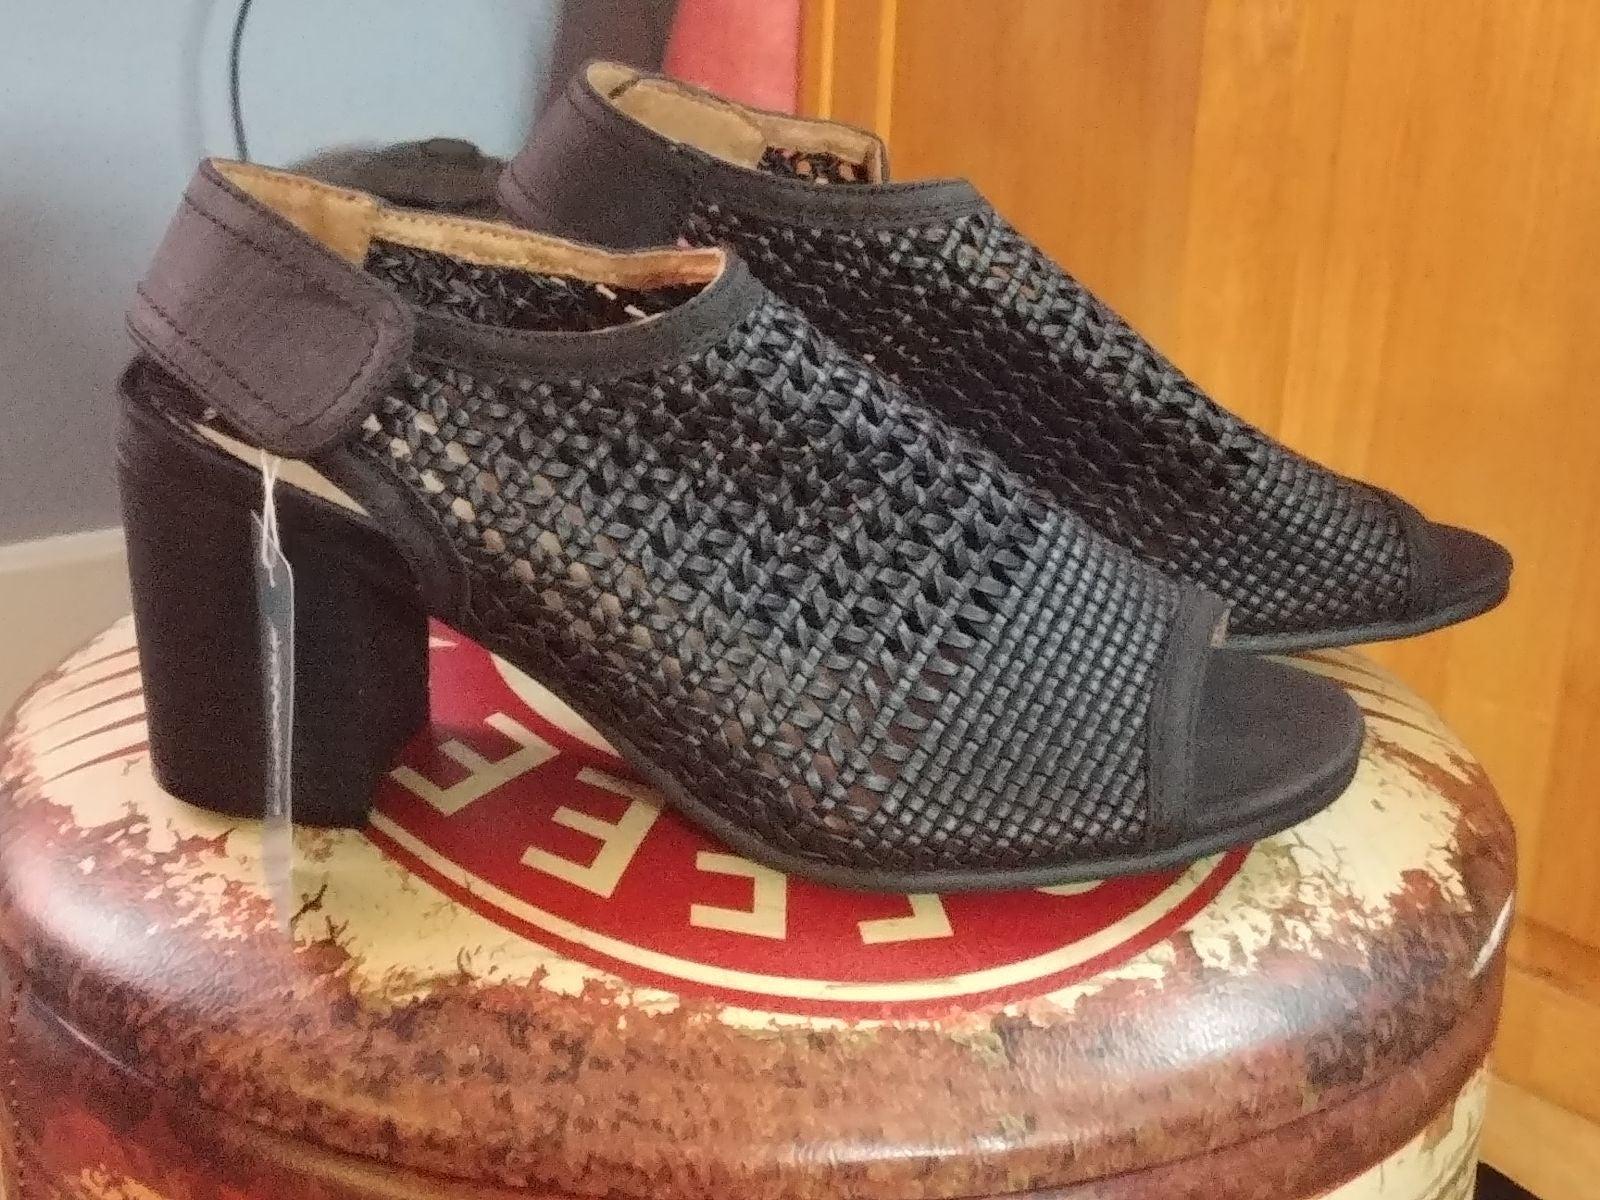 Women's open toe sandals